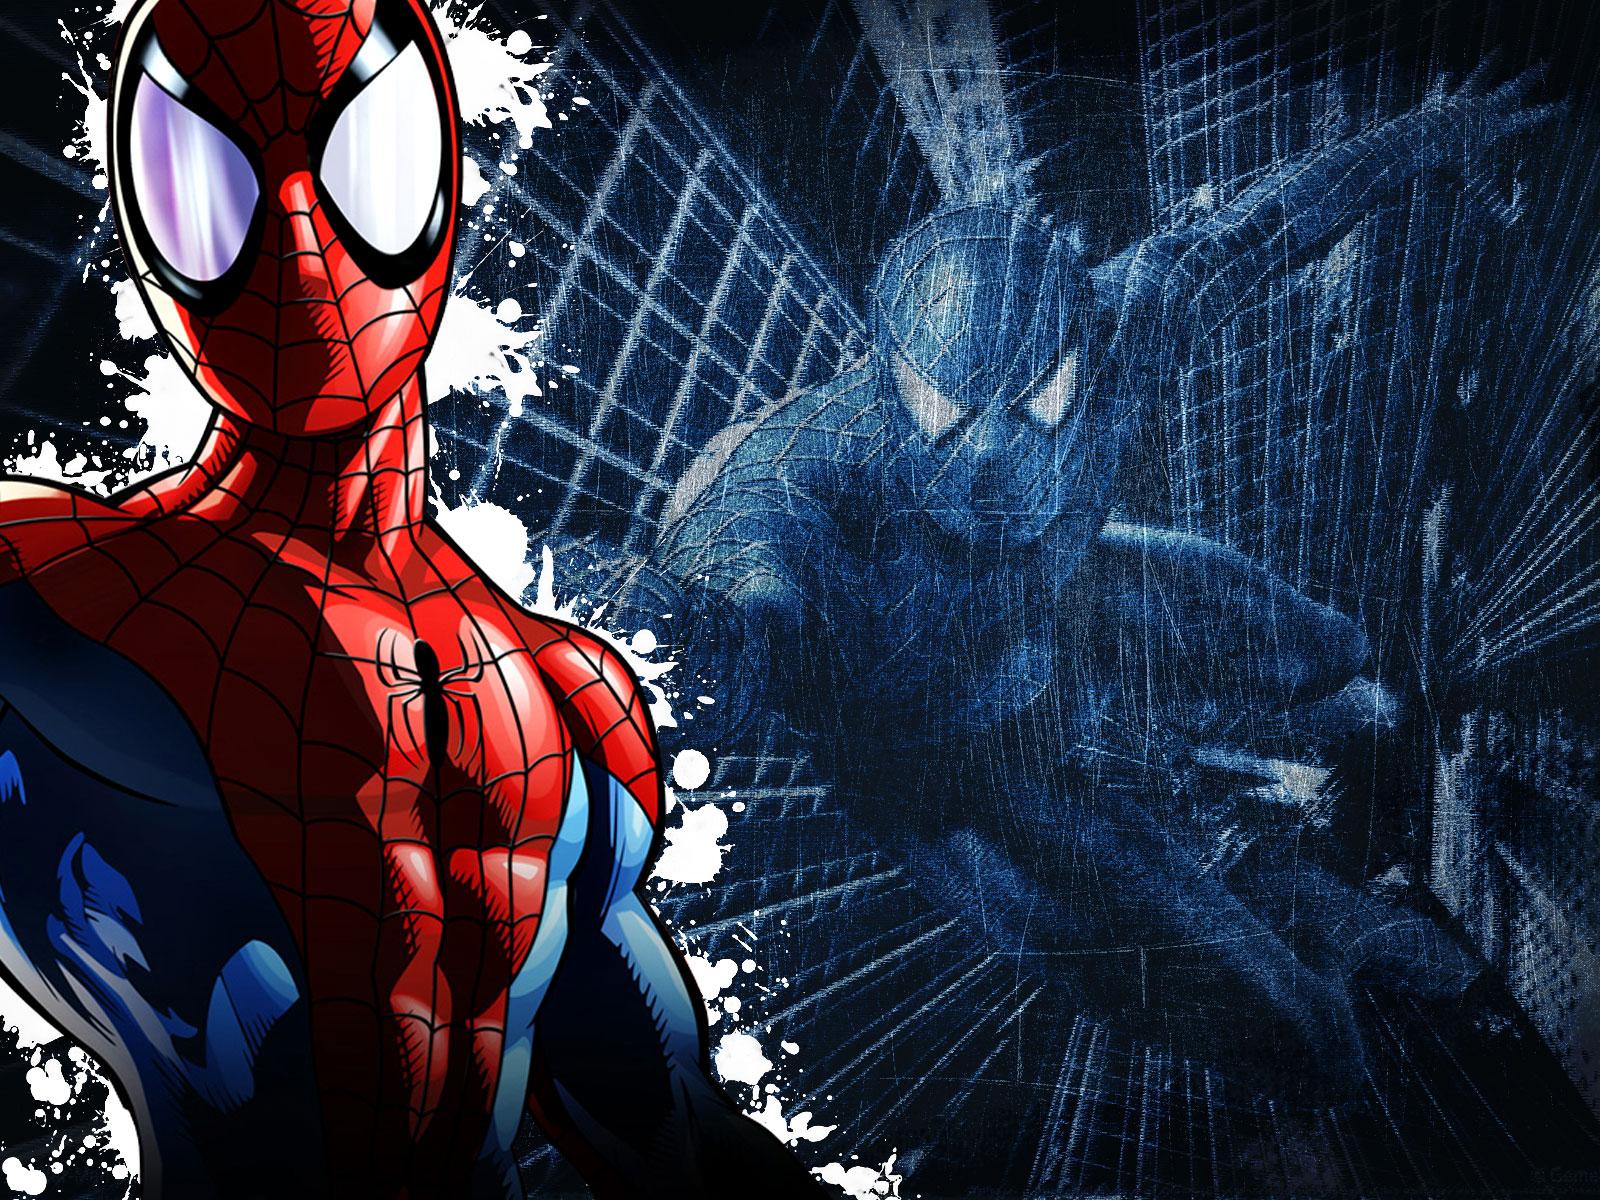 The Spiderman Wallpaper Spiderman 1600x1200